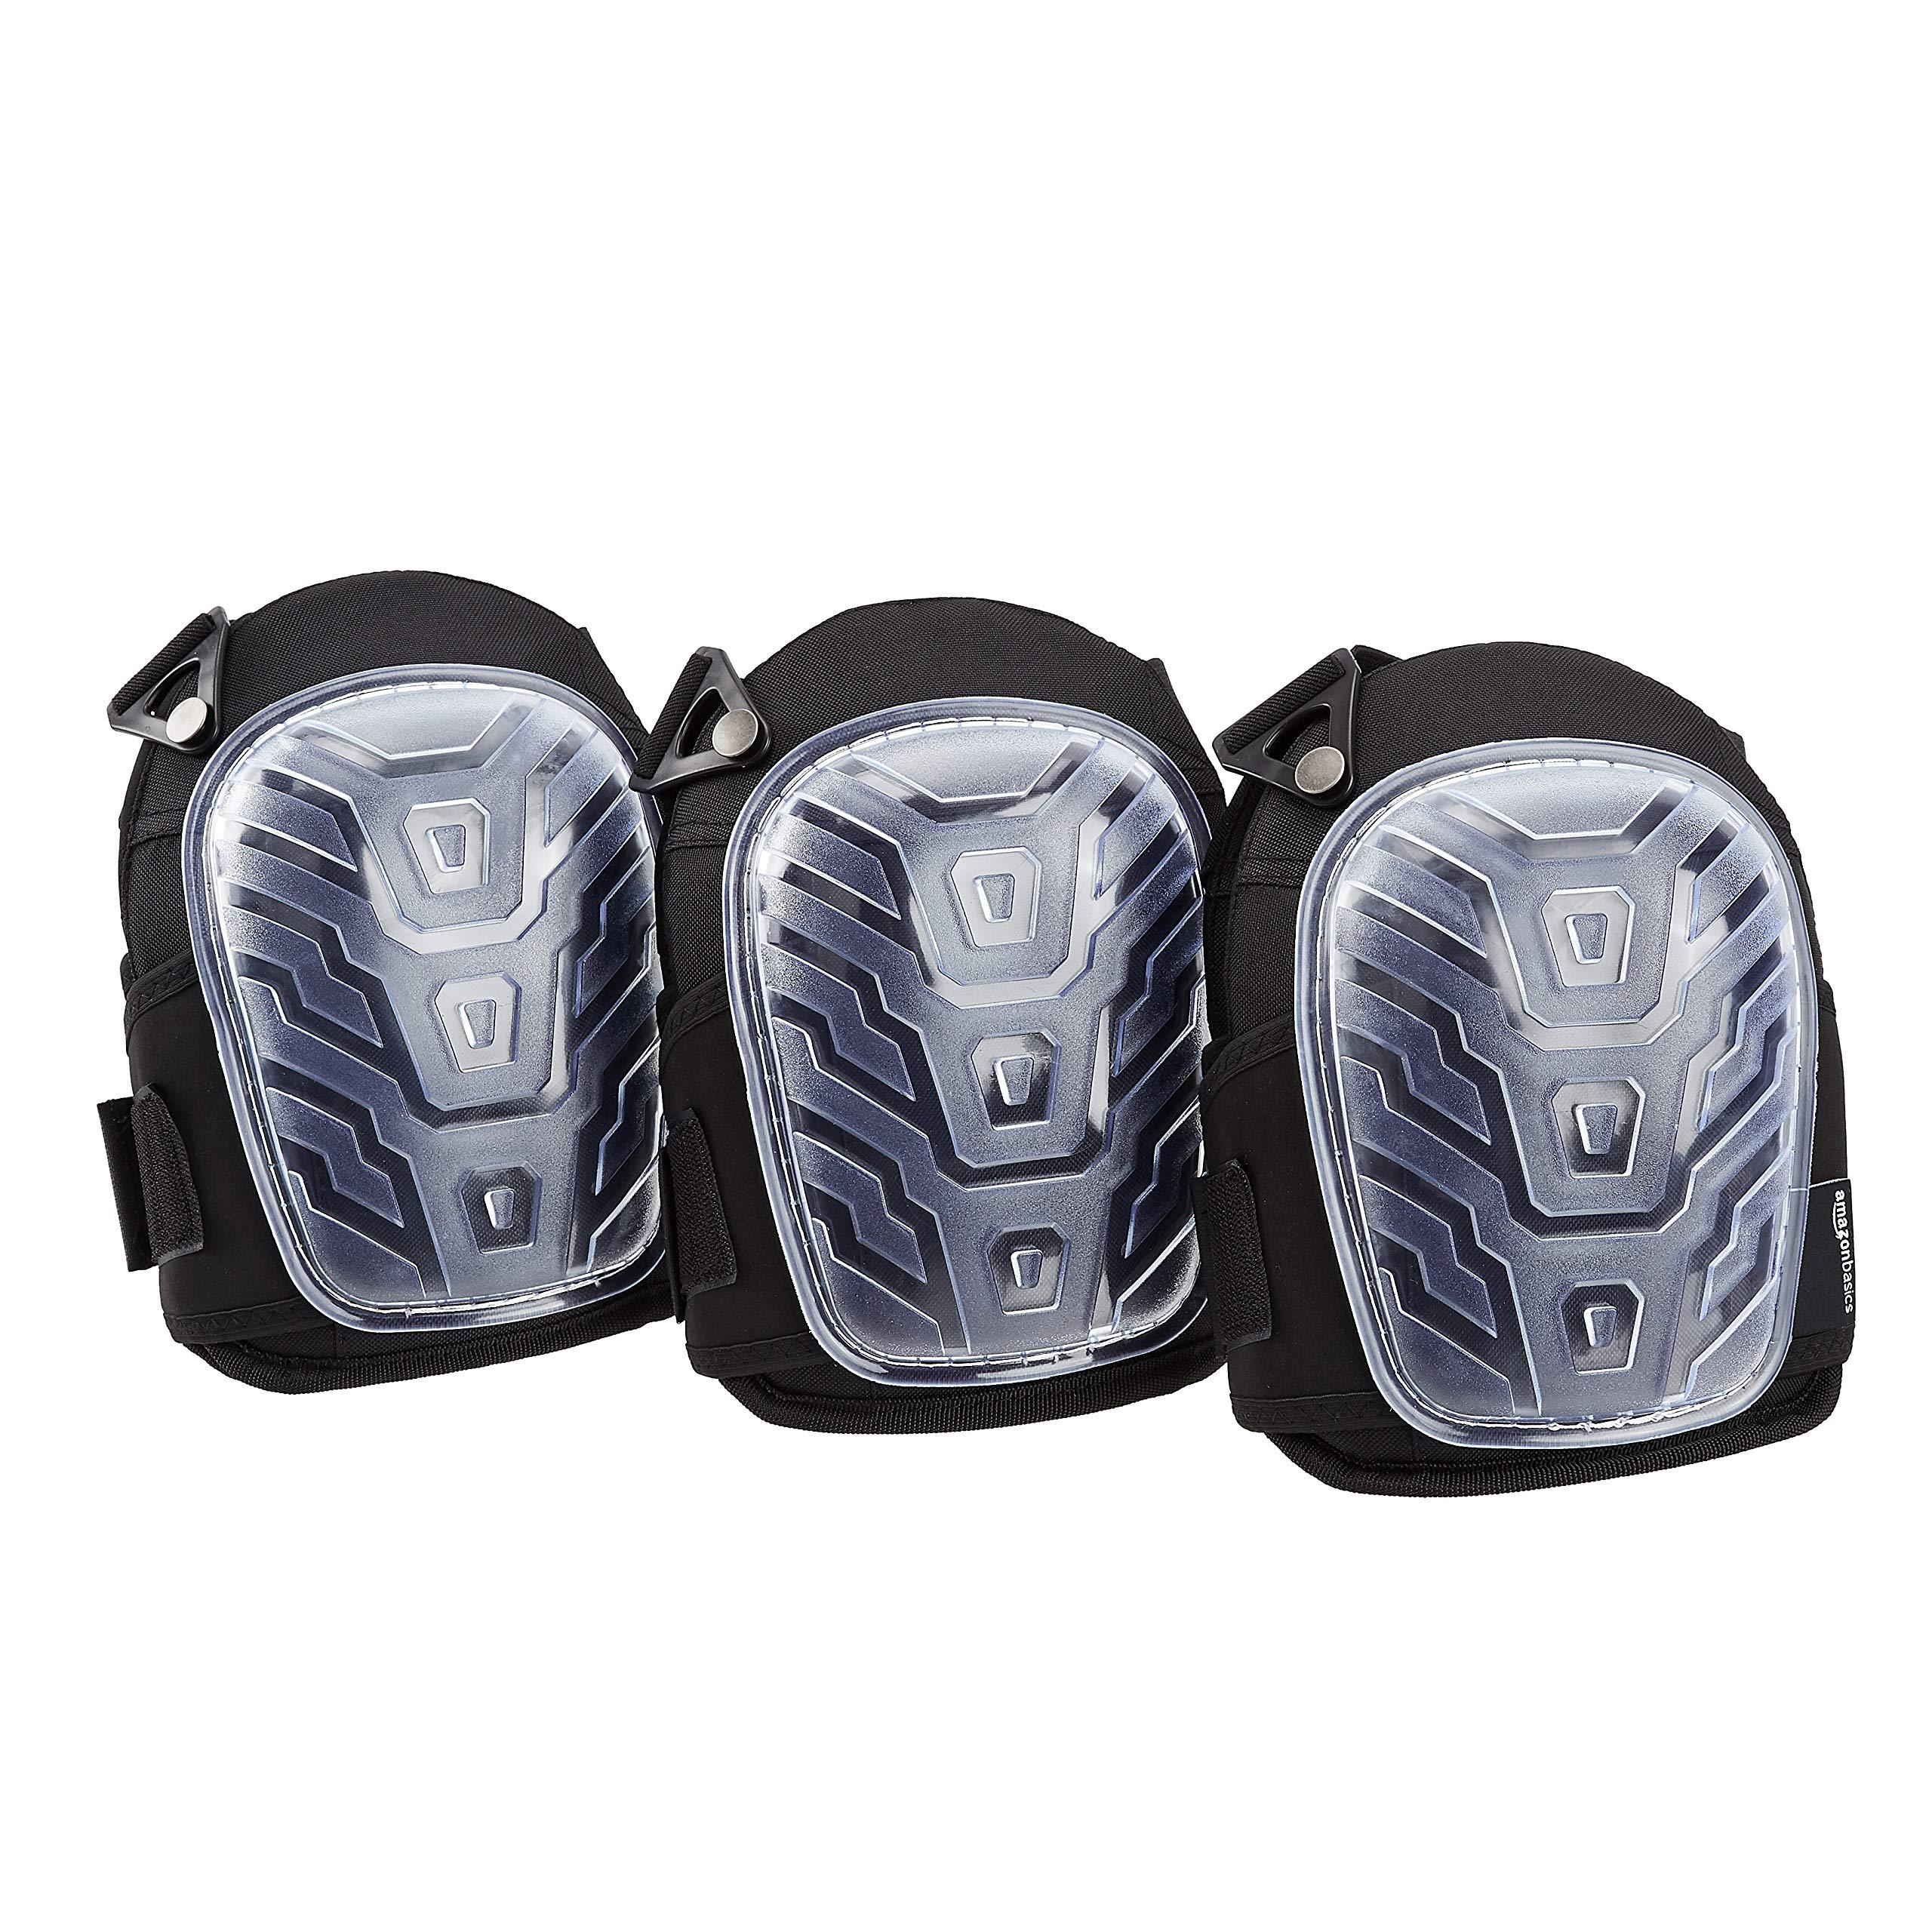 AmazonBasics Professional Gel Cushion Knee Pads - 3 Pair, Clear